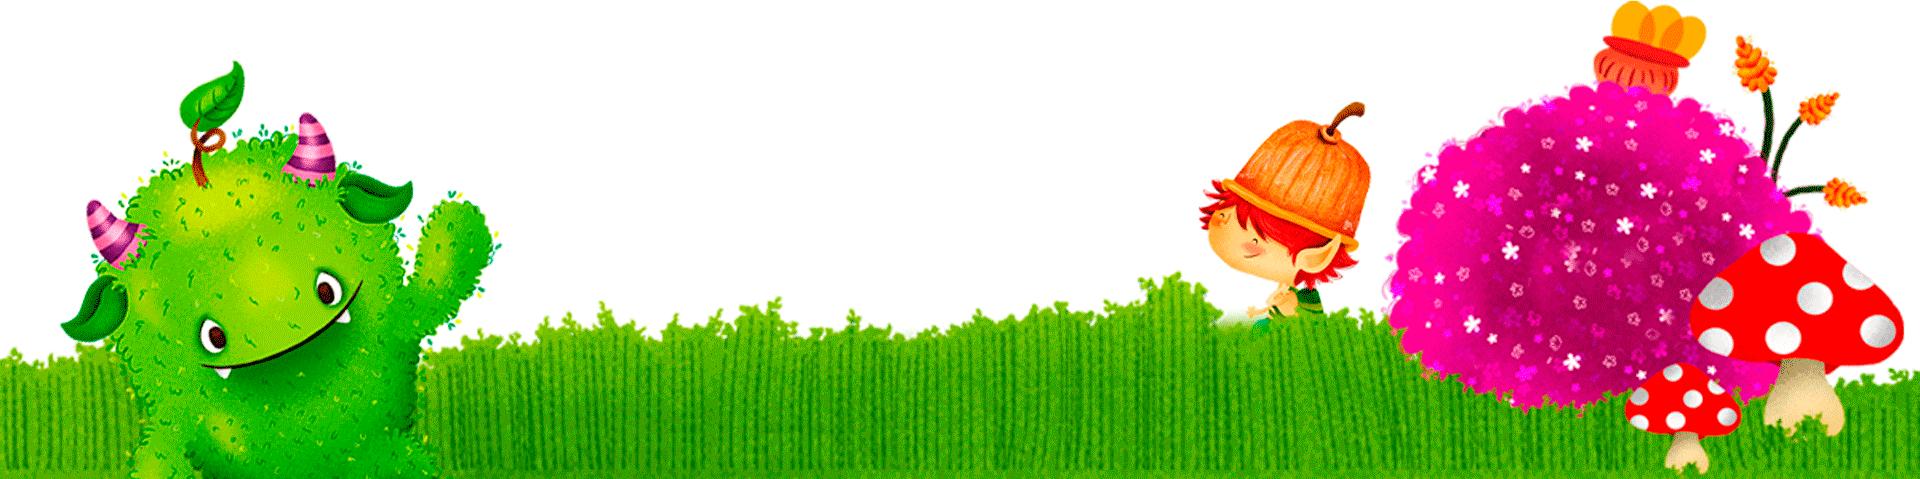 grama 5 - magic forest